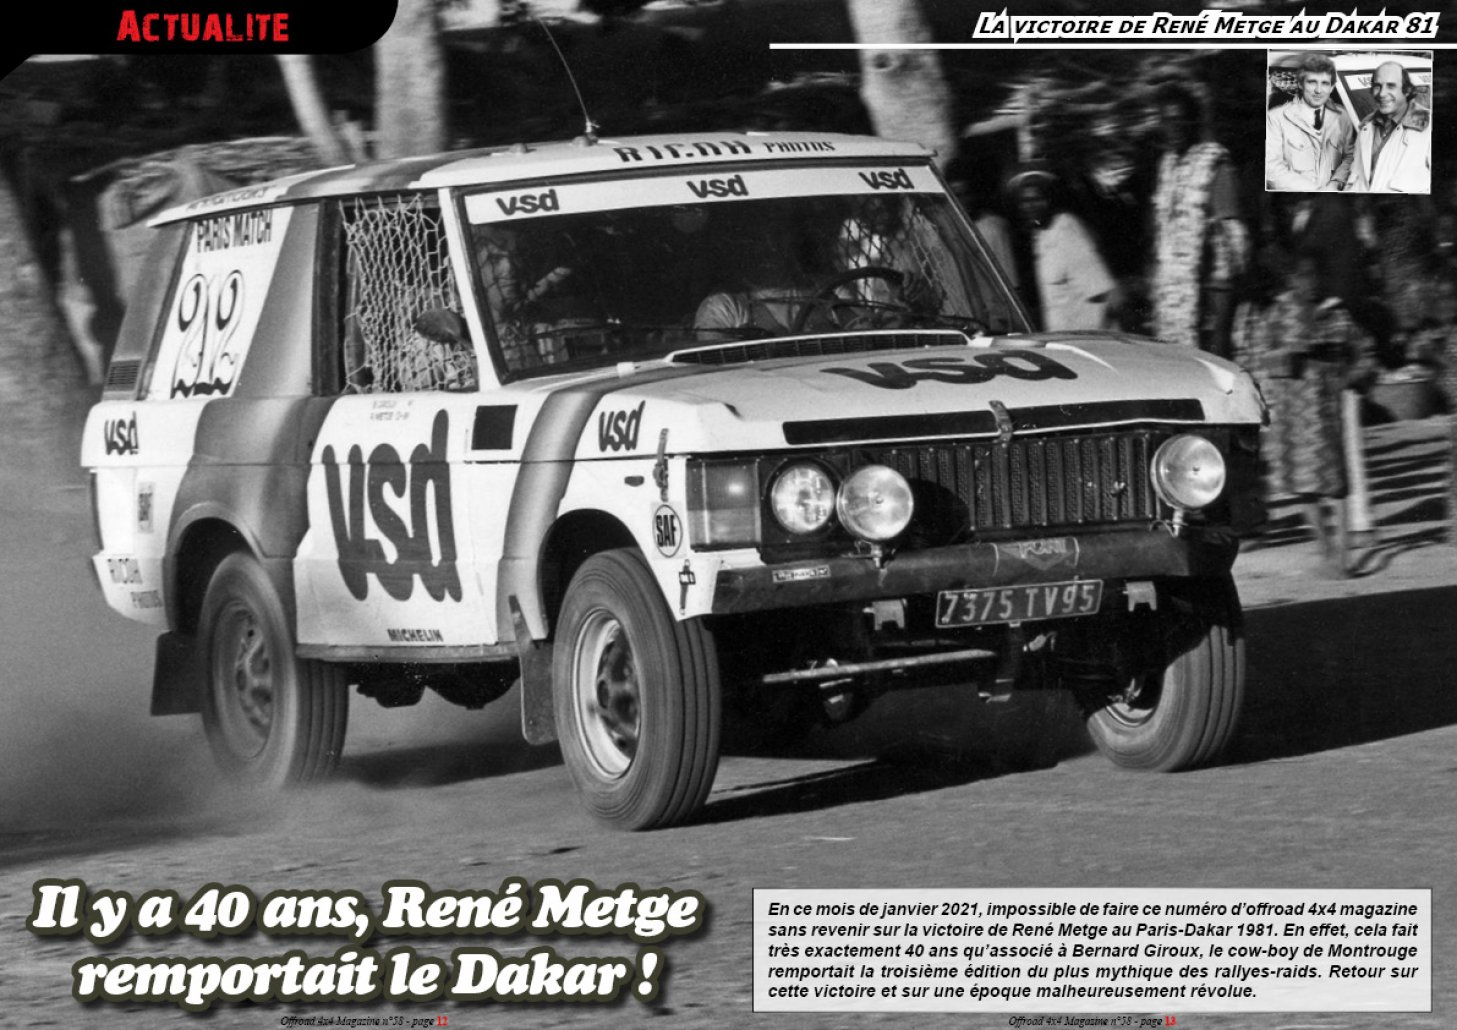 La victoire de René Metge au Dakar 81